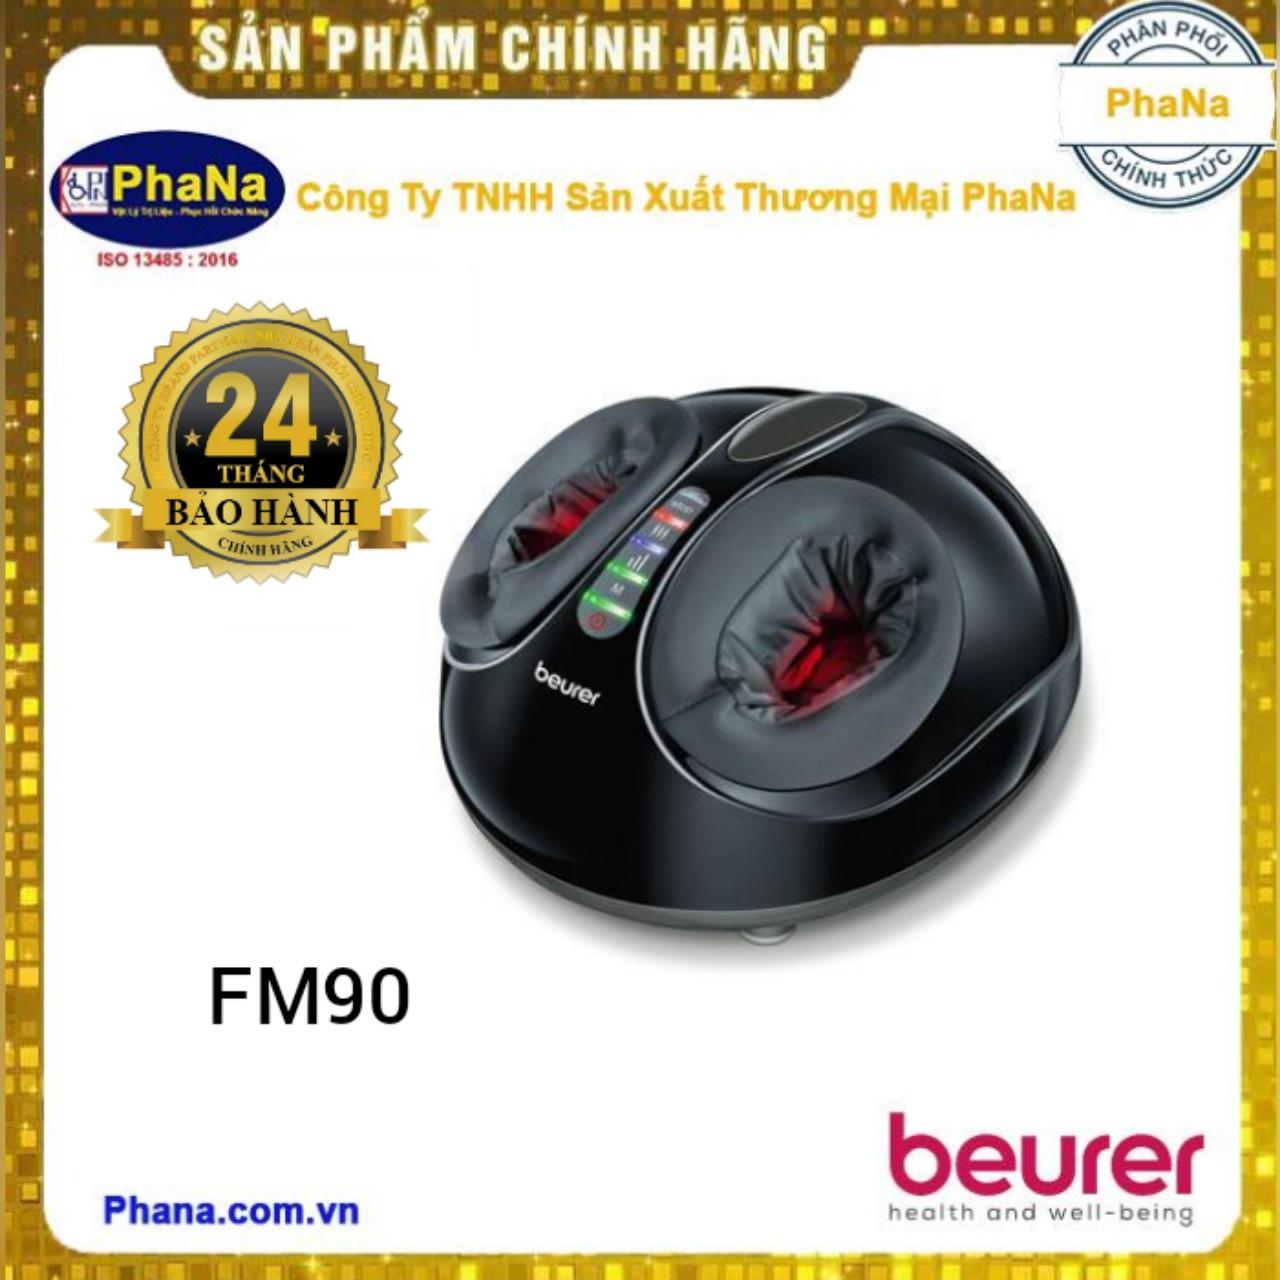 MÁY MASSAGE BÀN CHÂN FM90